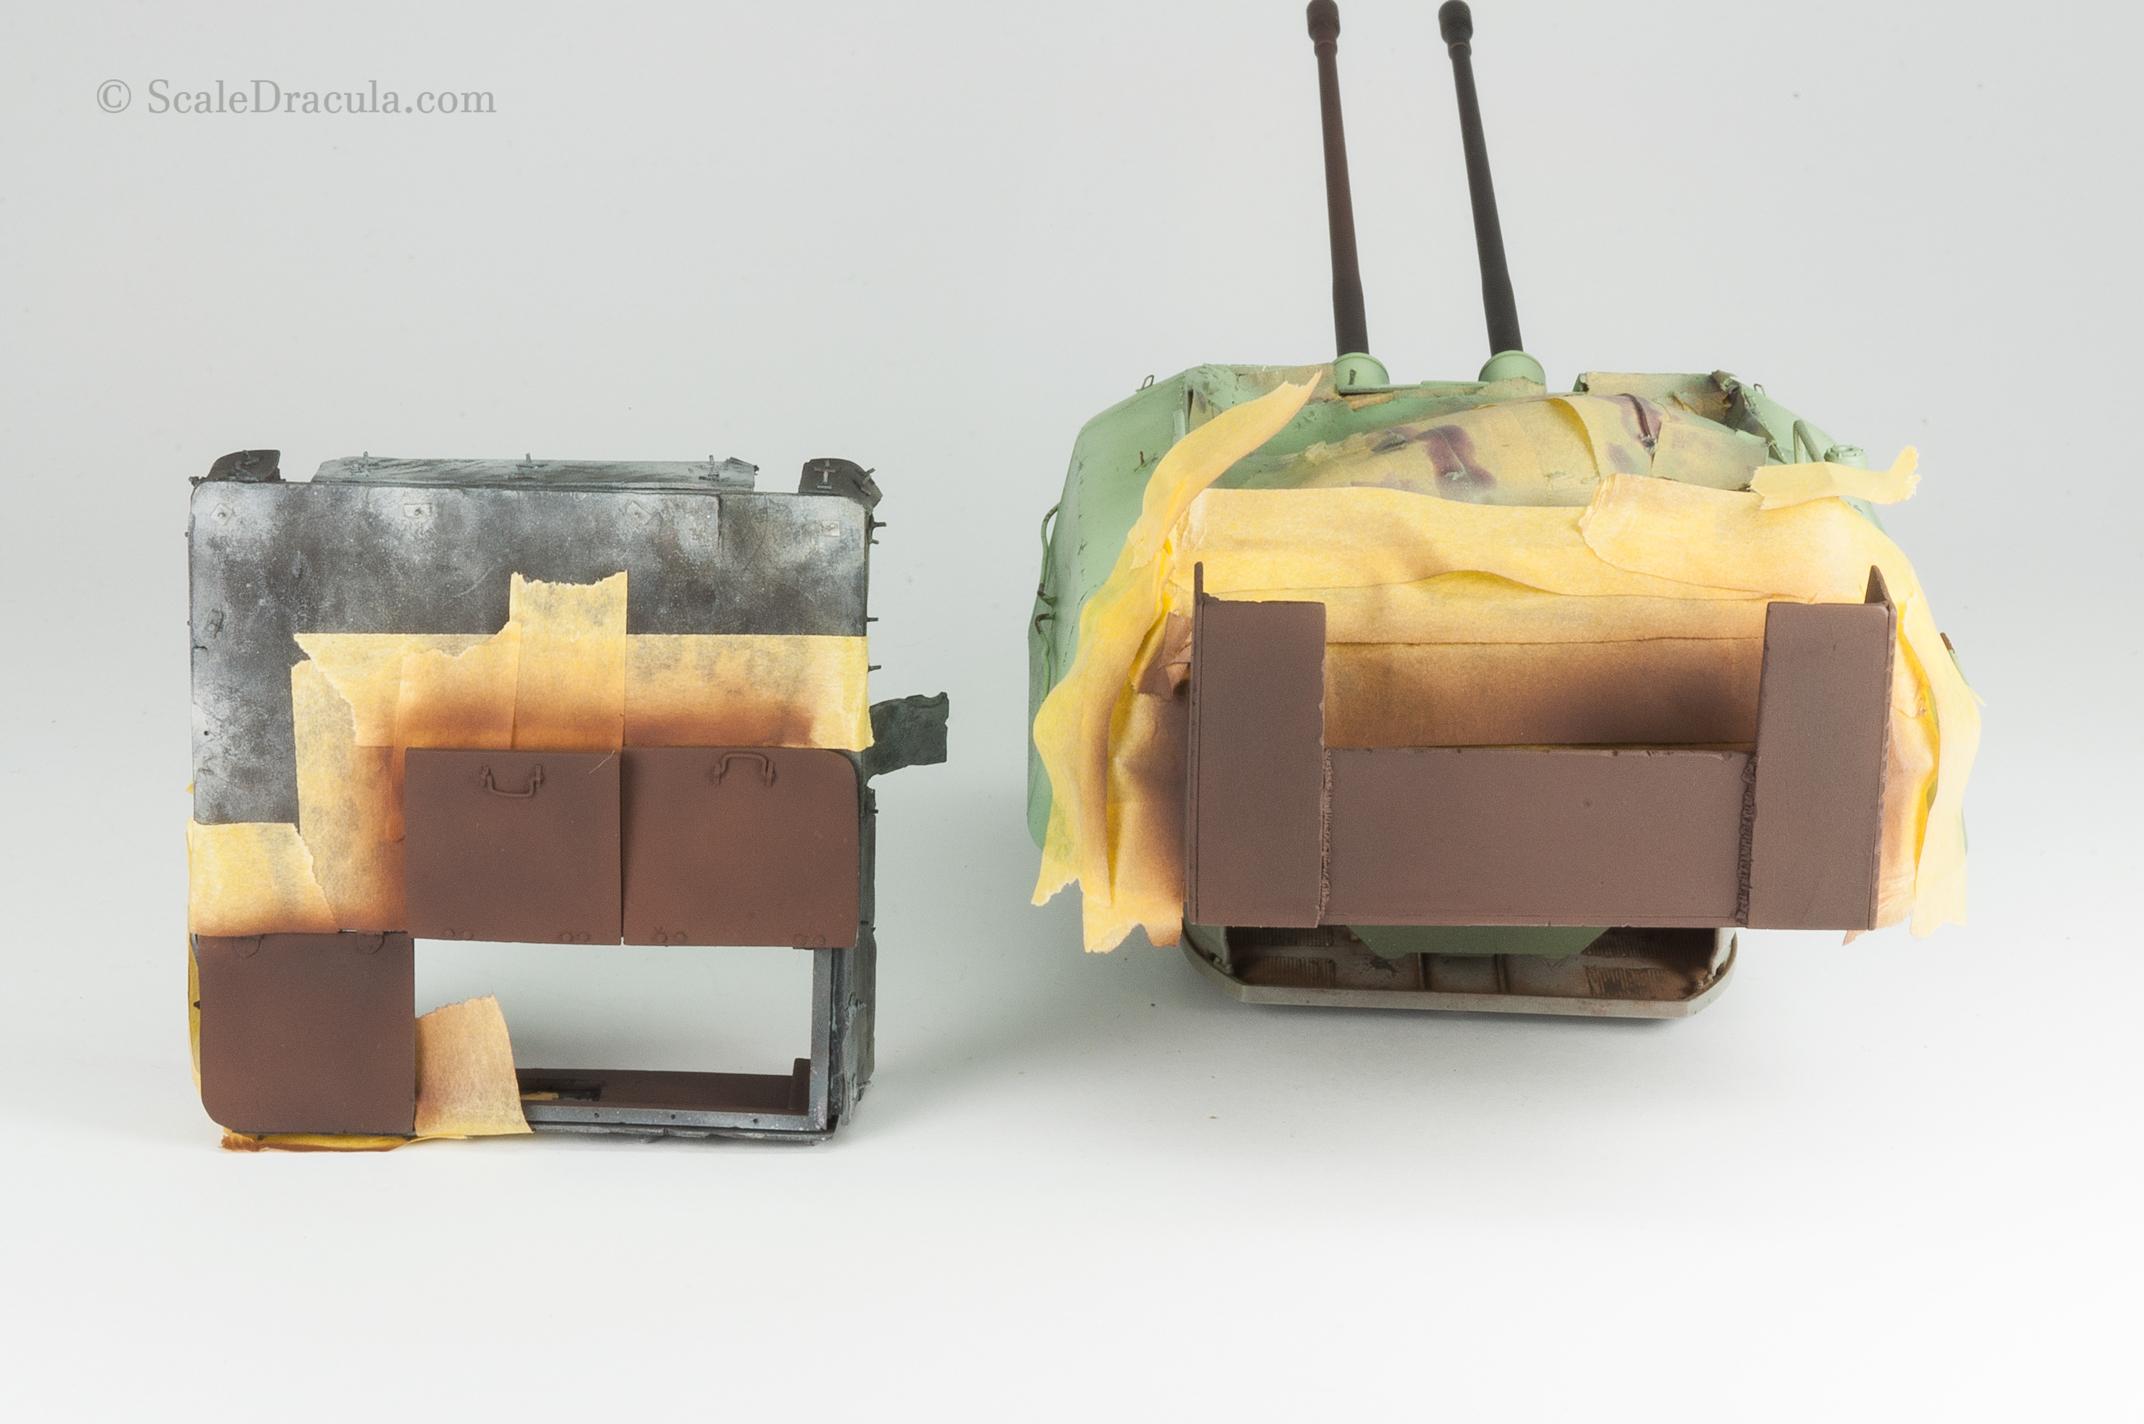 Rust base colour, ZSU-57 by TAKOM